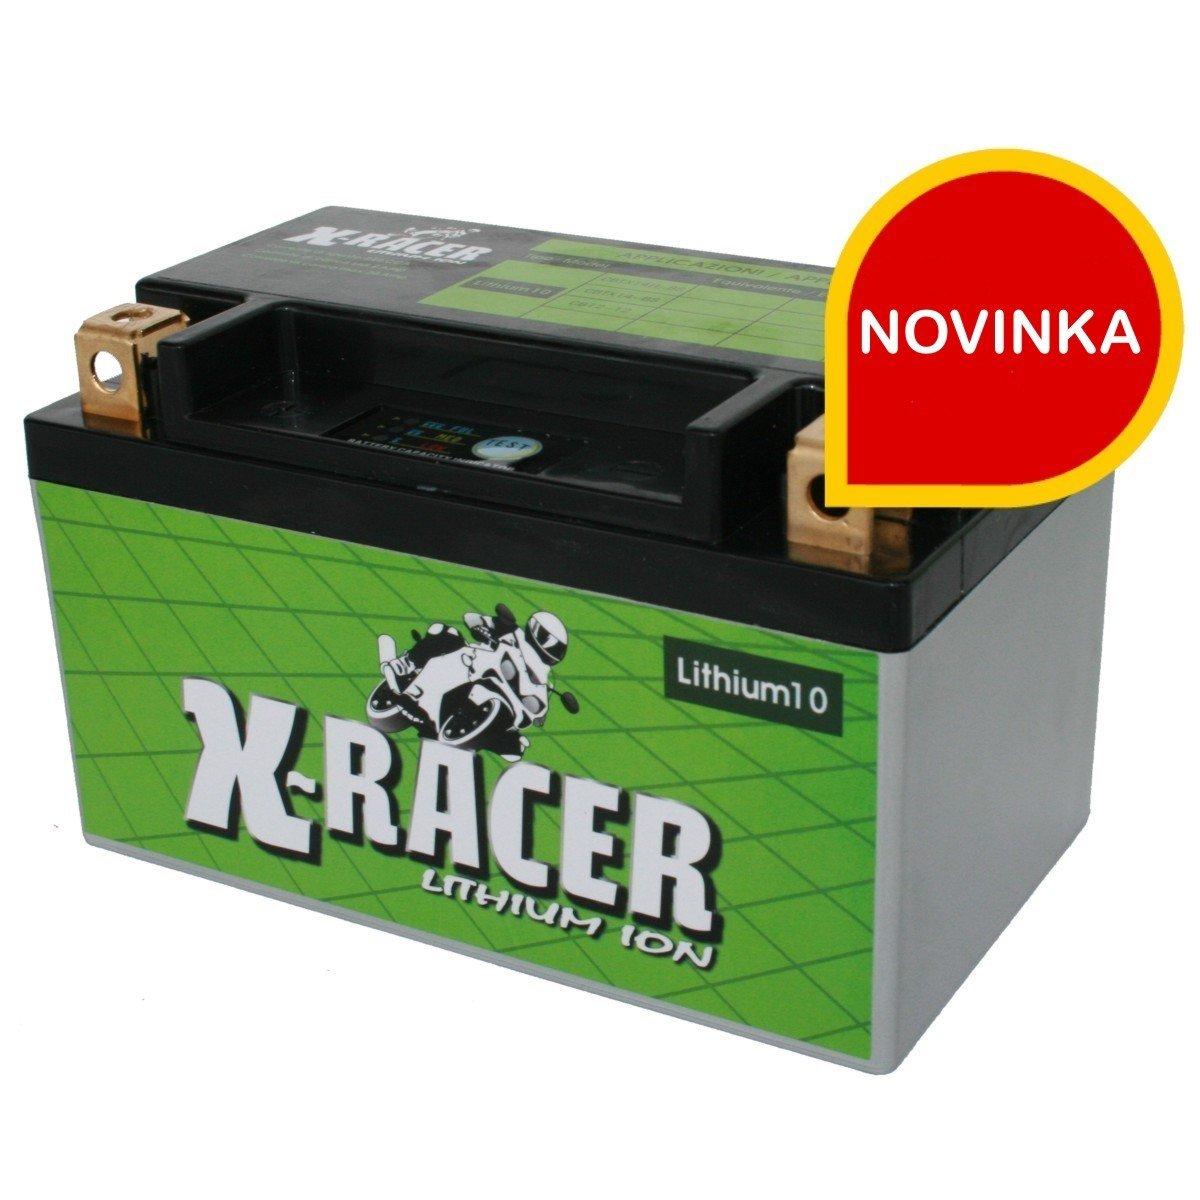 X-RACER Lithium10